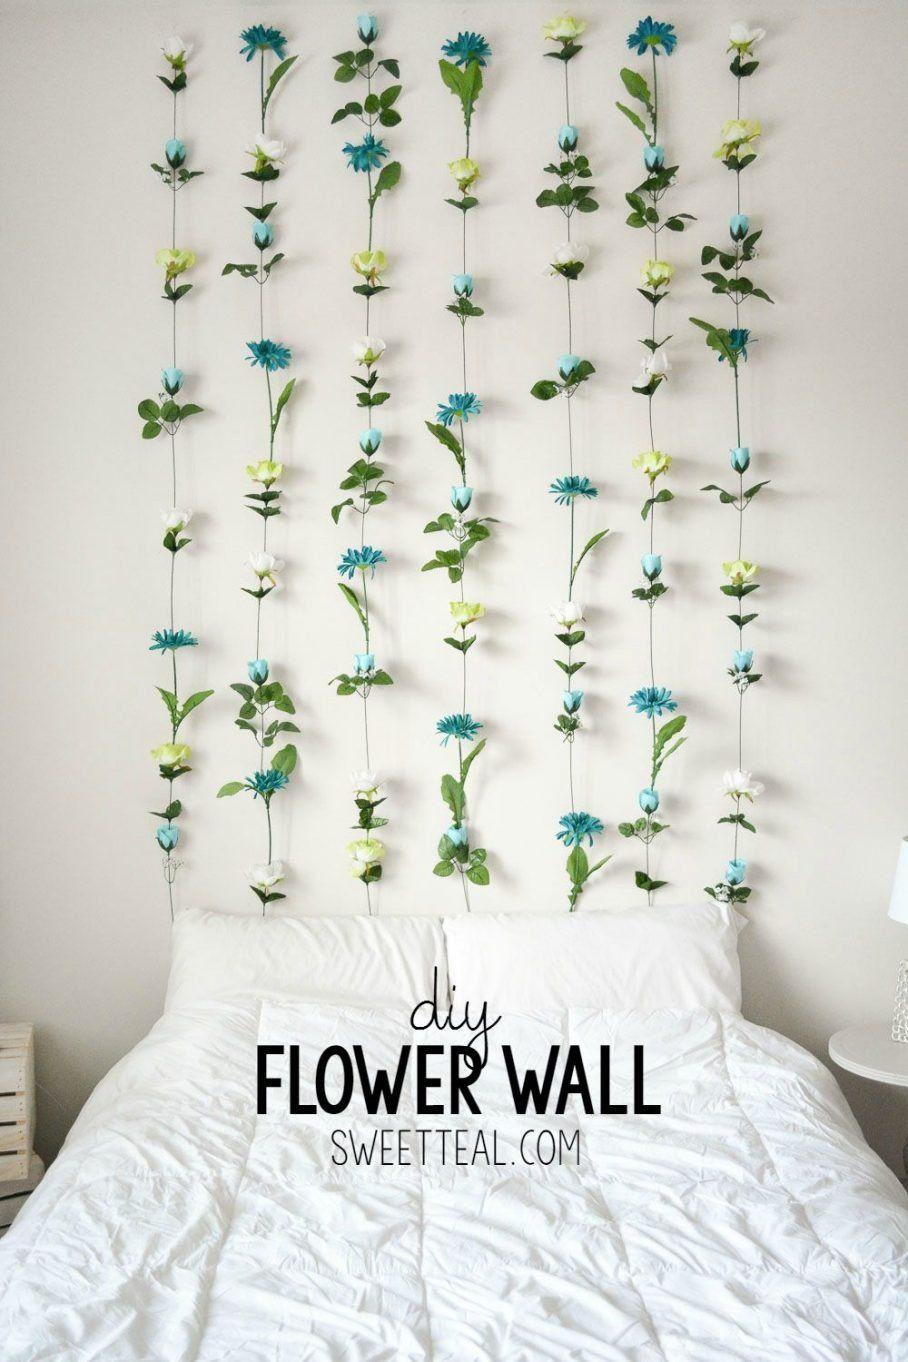 Bedroom Wall Decor Diy Diy Bedroom Wall Decorating Ideas Pinterest Master Decor Diy Wall Decor For Bedroom Diy Flower Wall Wall Decor Bedroom